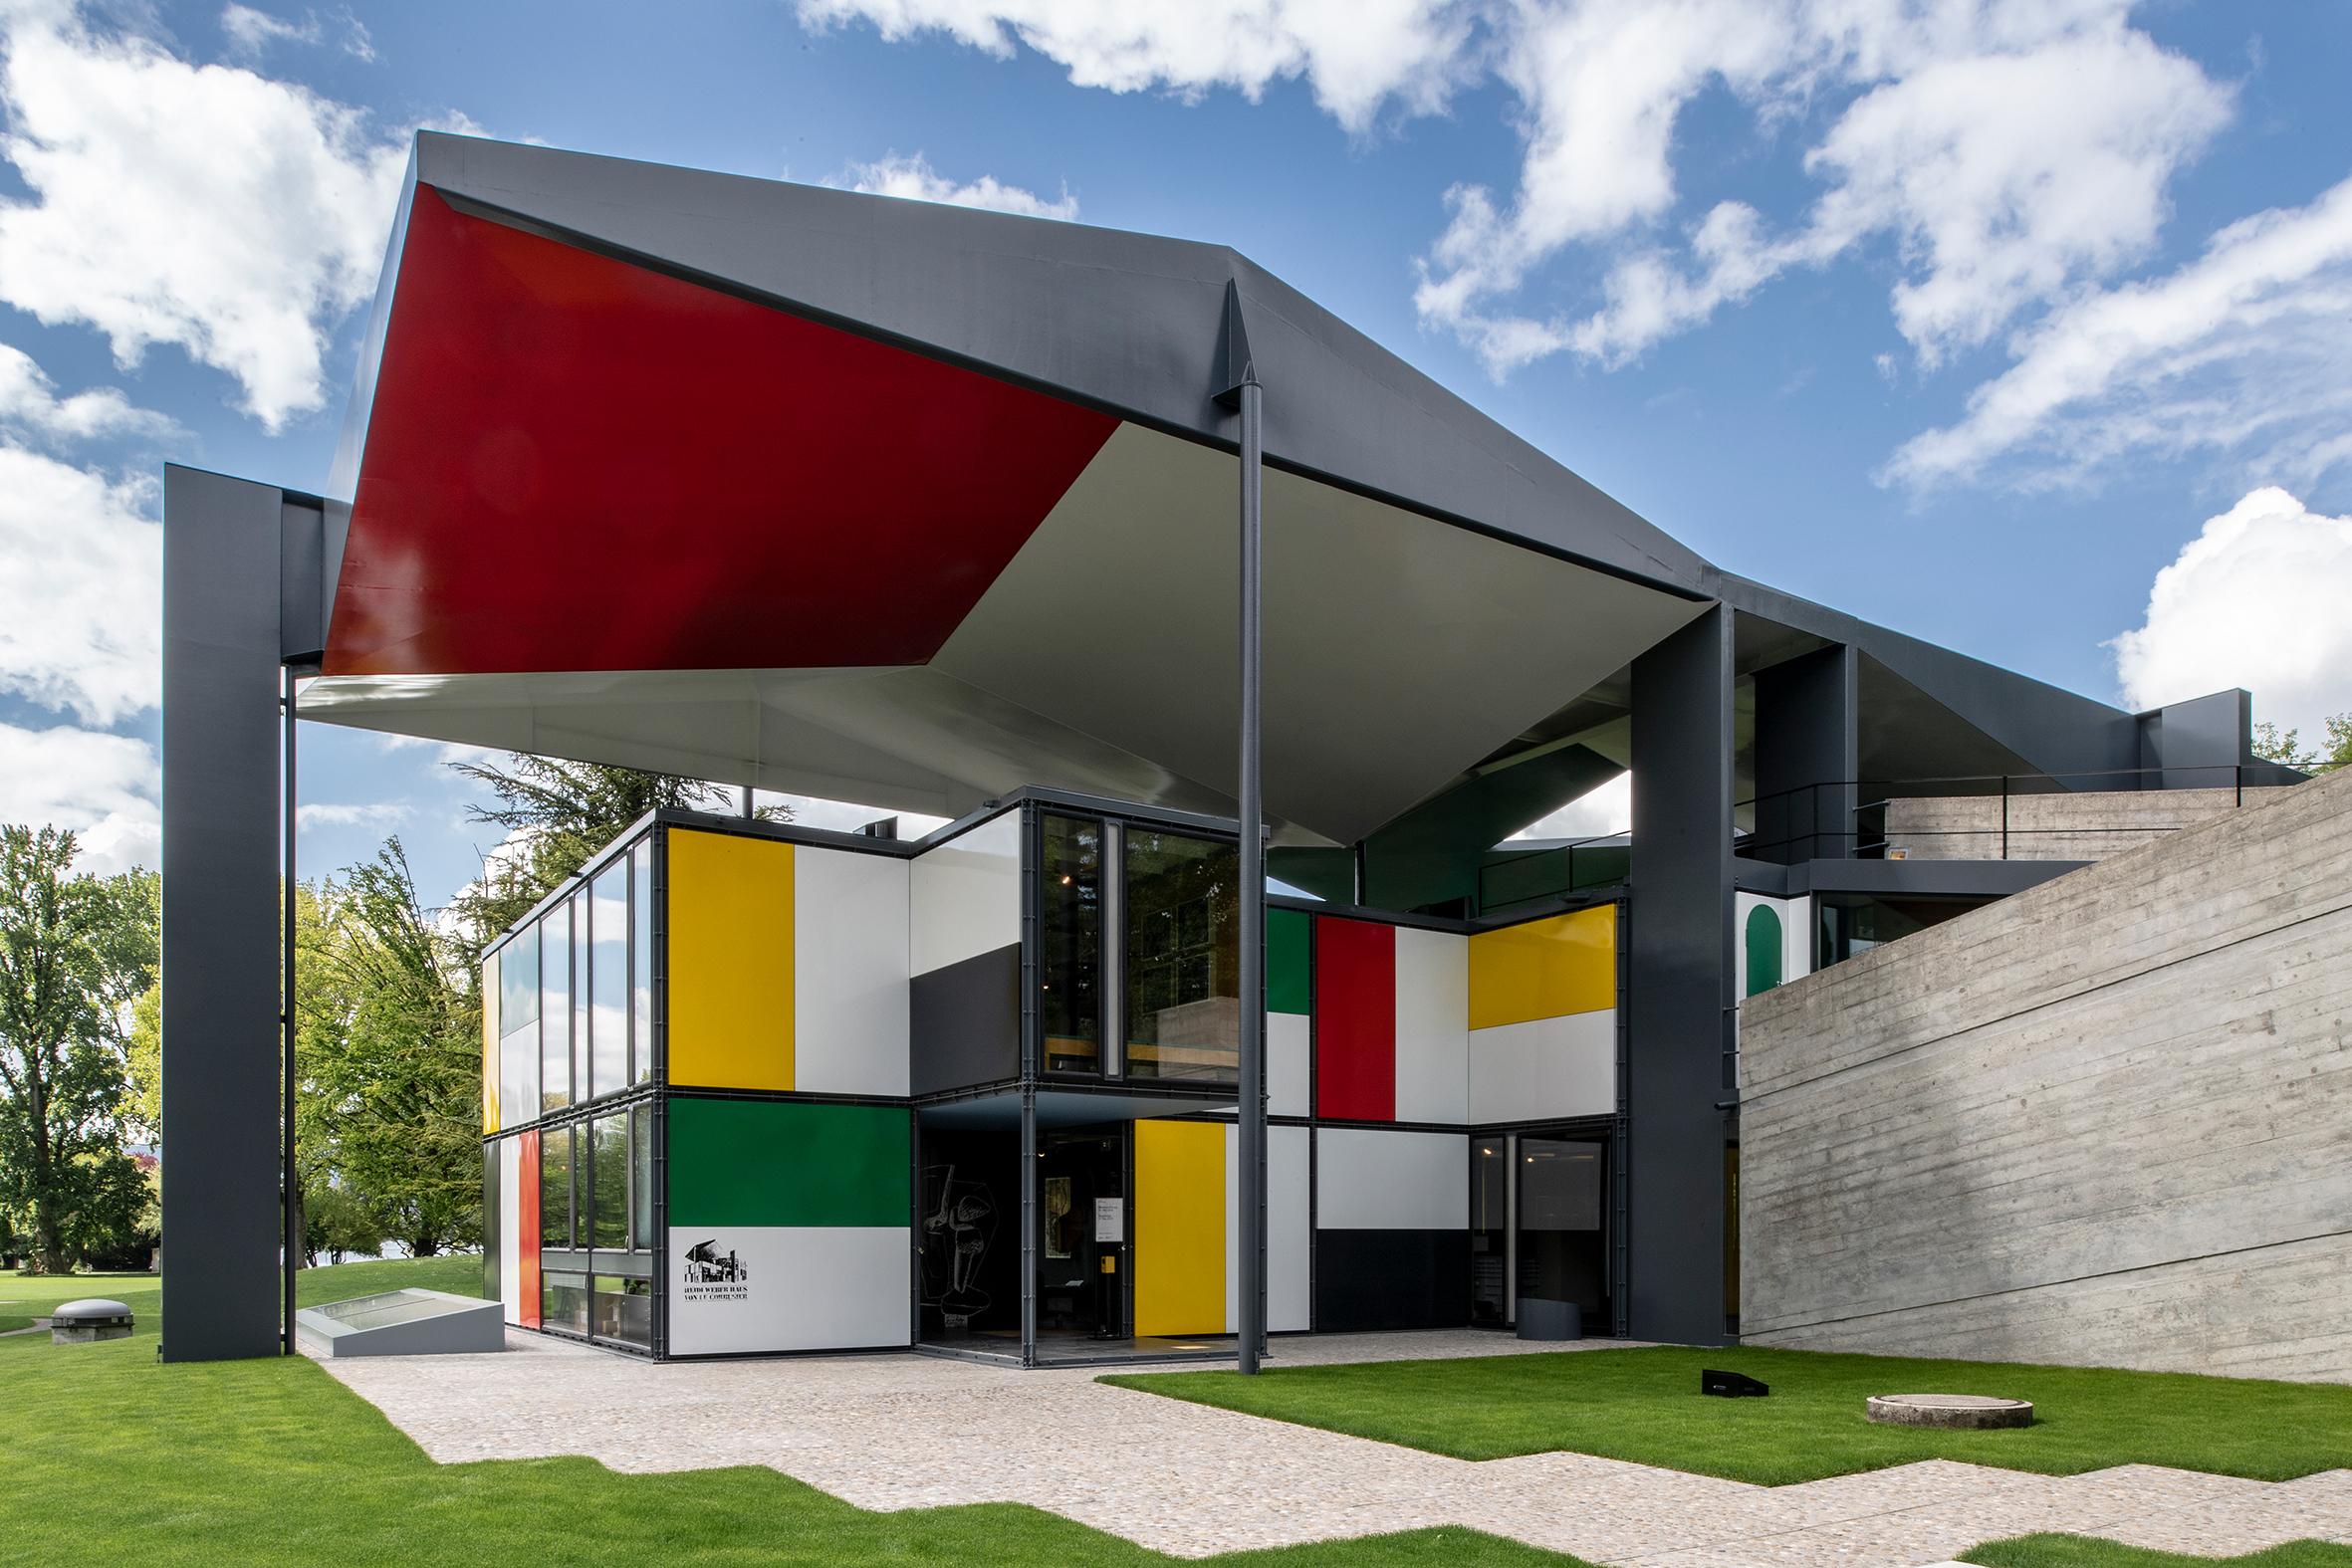 03_Pavillon Le Corbusier.jpg